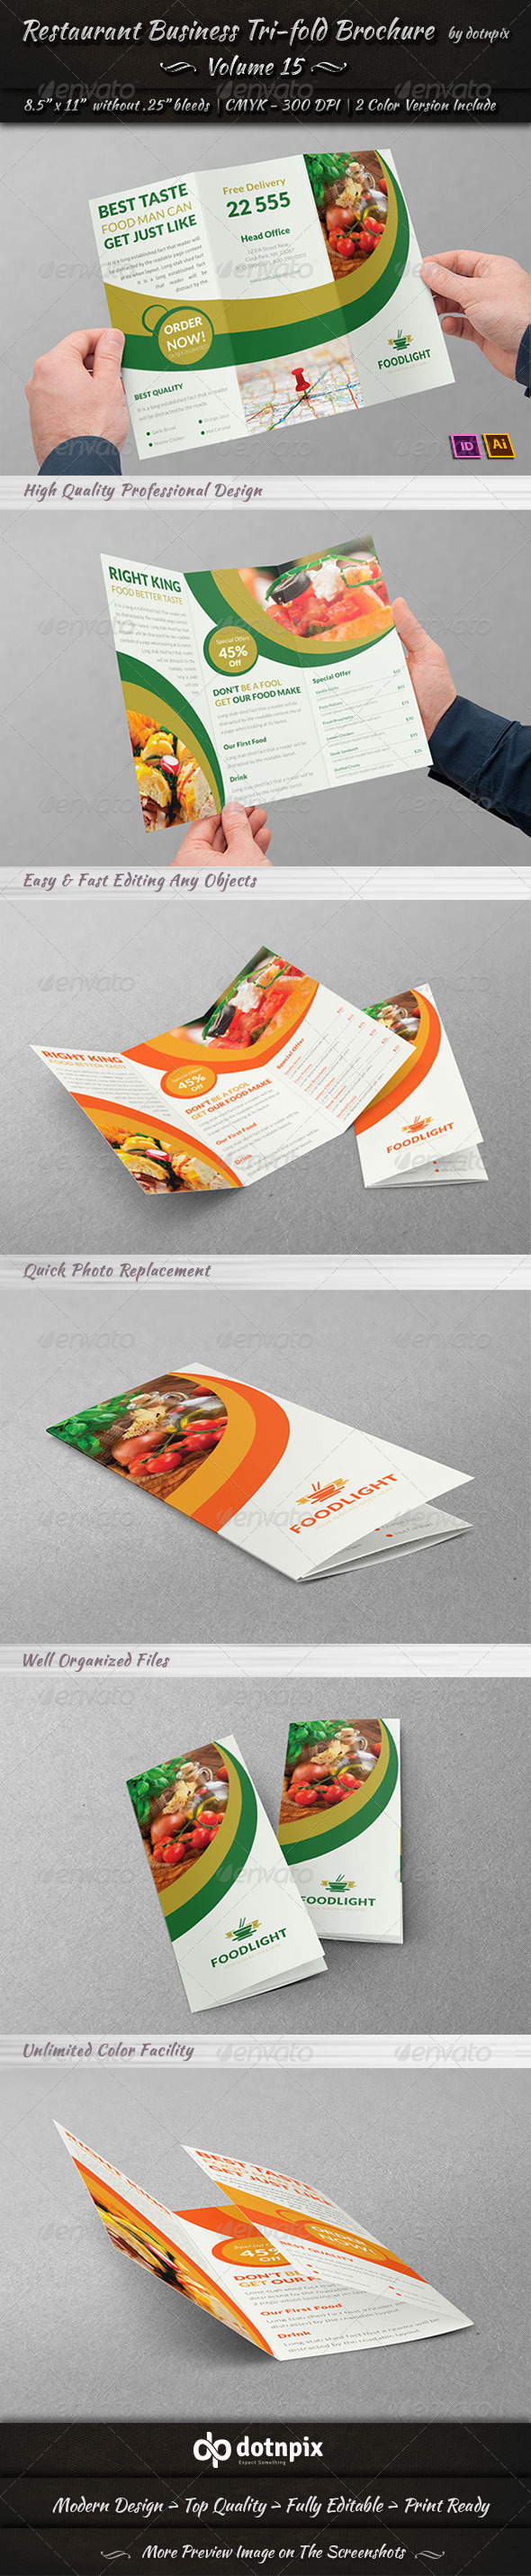 GraphicRiver Restaurant Business Tri-Fold Brochure Volume 15 7905417